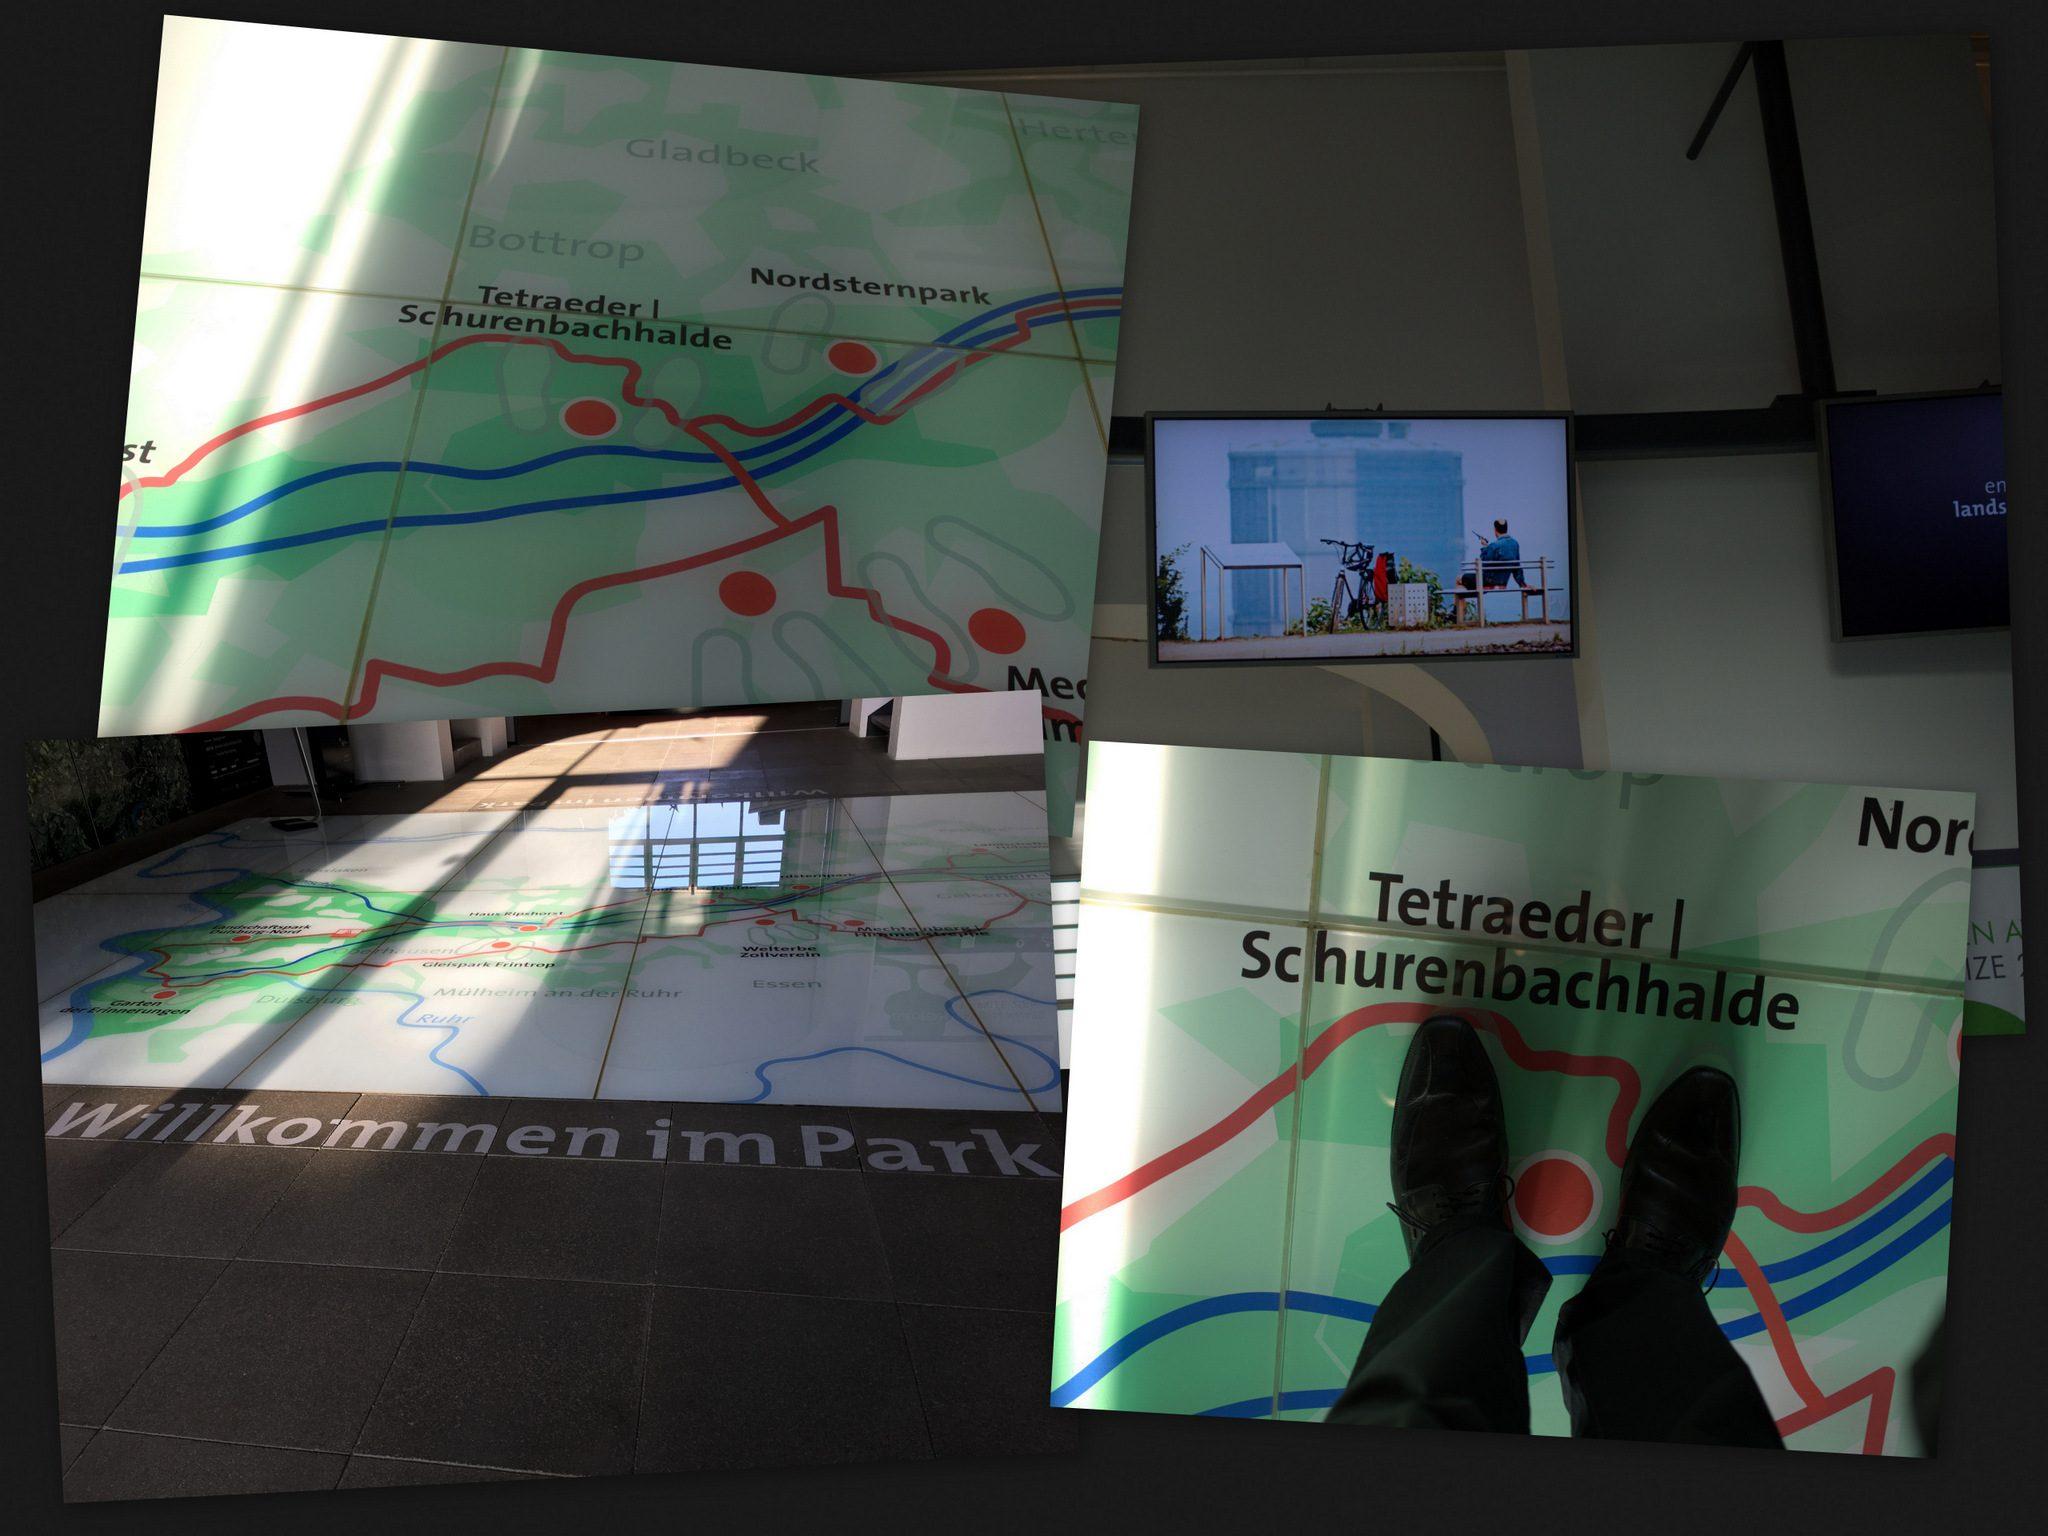 Interaktive Karte des Emscher Landschaftsparks.